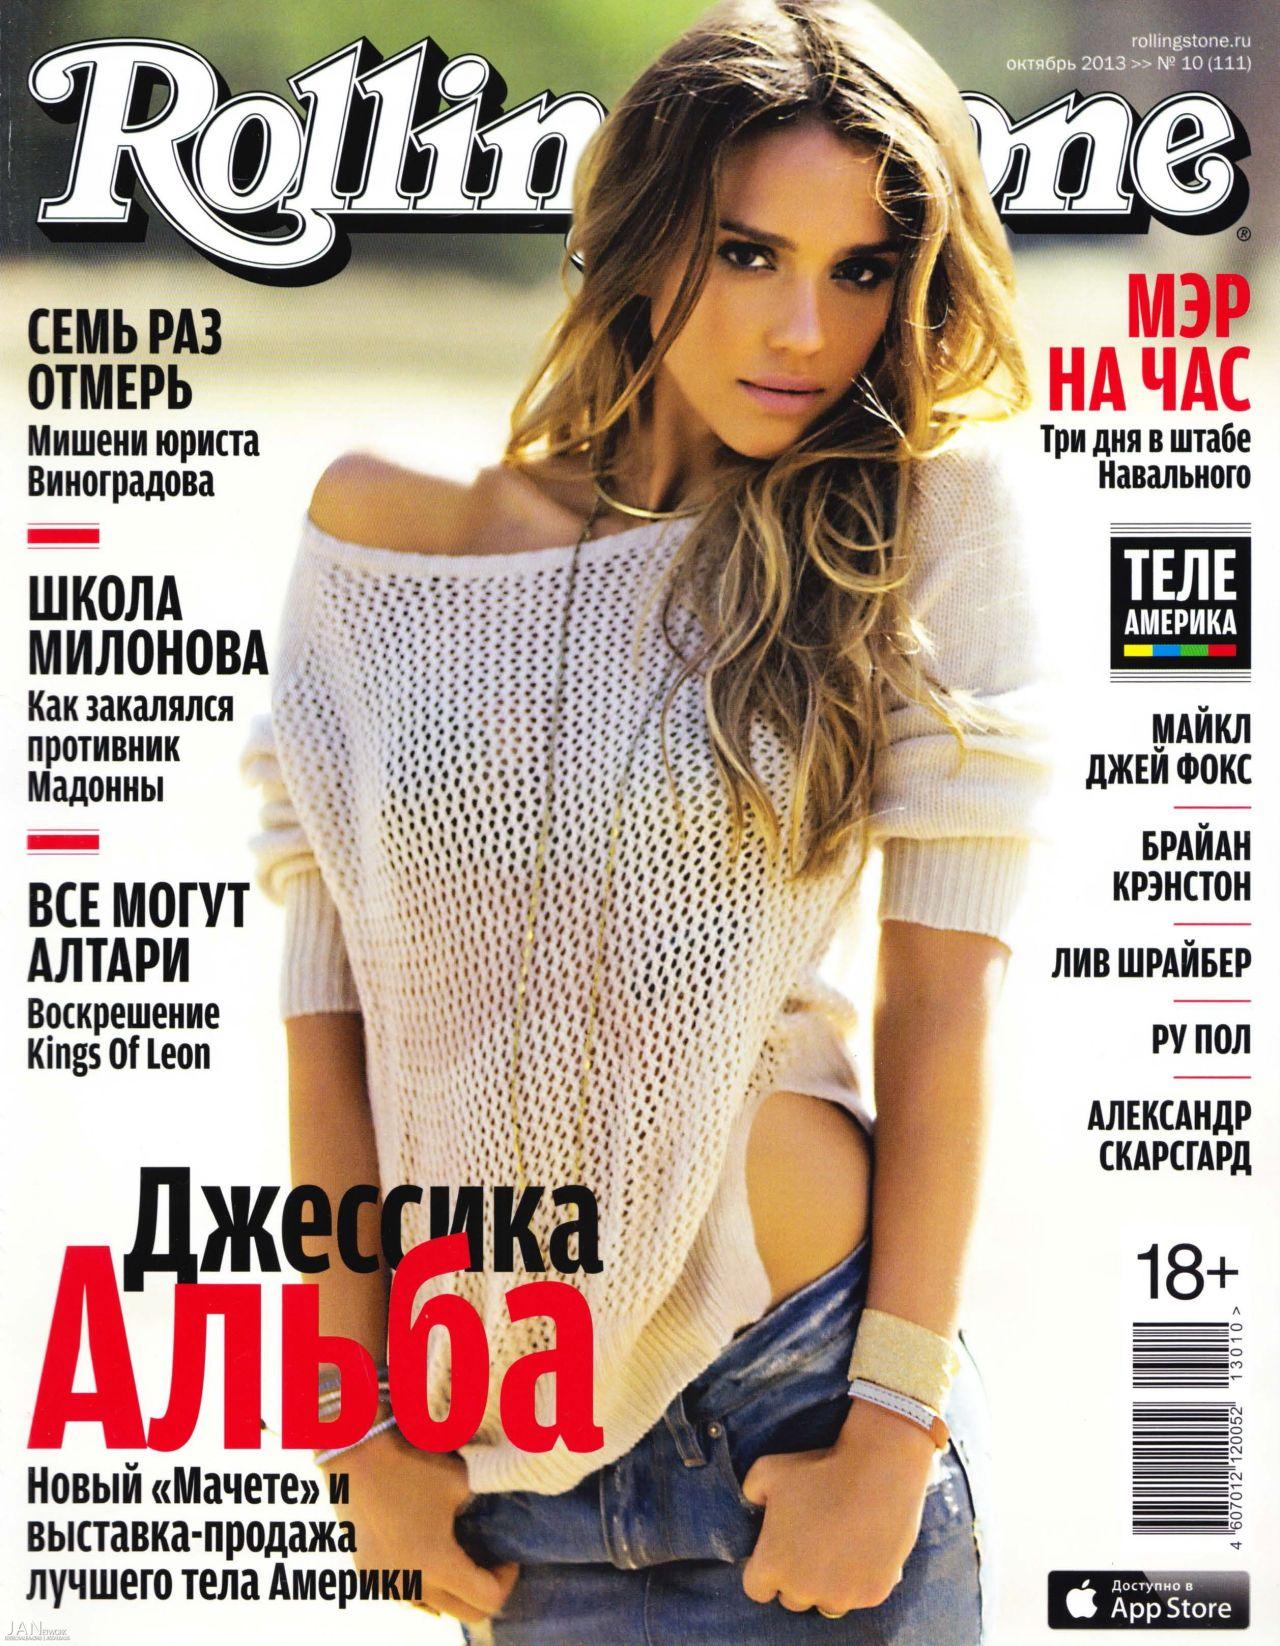 Jessica Alba in ROLLING STONE Magazine Russia - October 2013 Issue